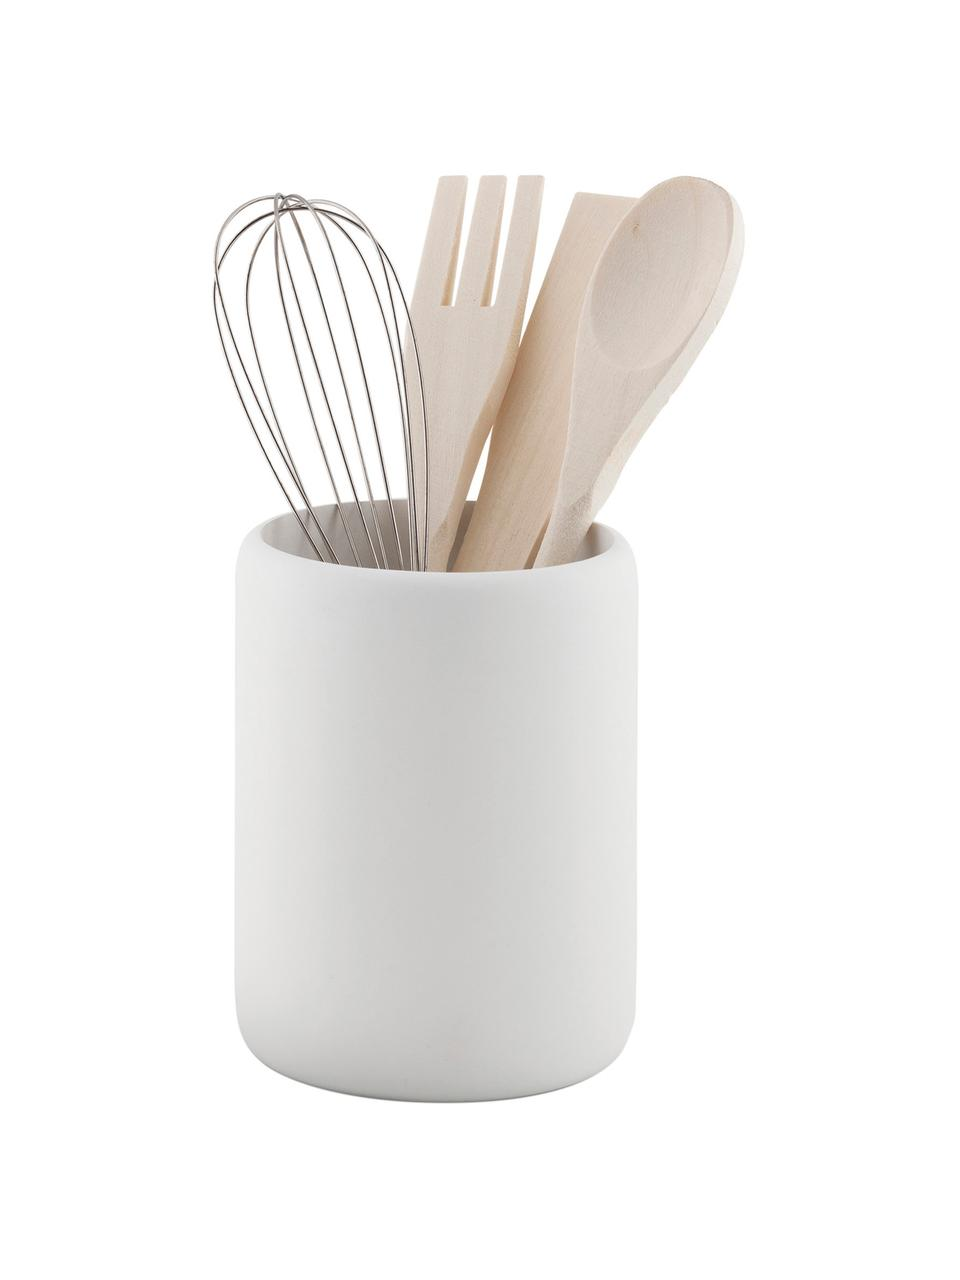 Küchenutensilien-Set Botta, 5-tlg., Behälter: Polyresin, Weiß, Holz, Ø 11 x H 23 cm